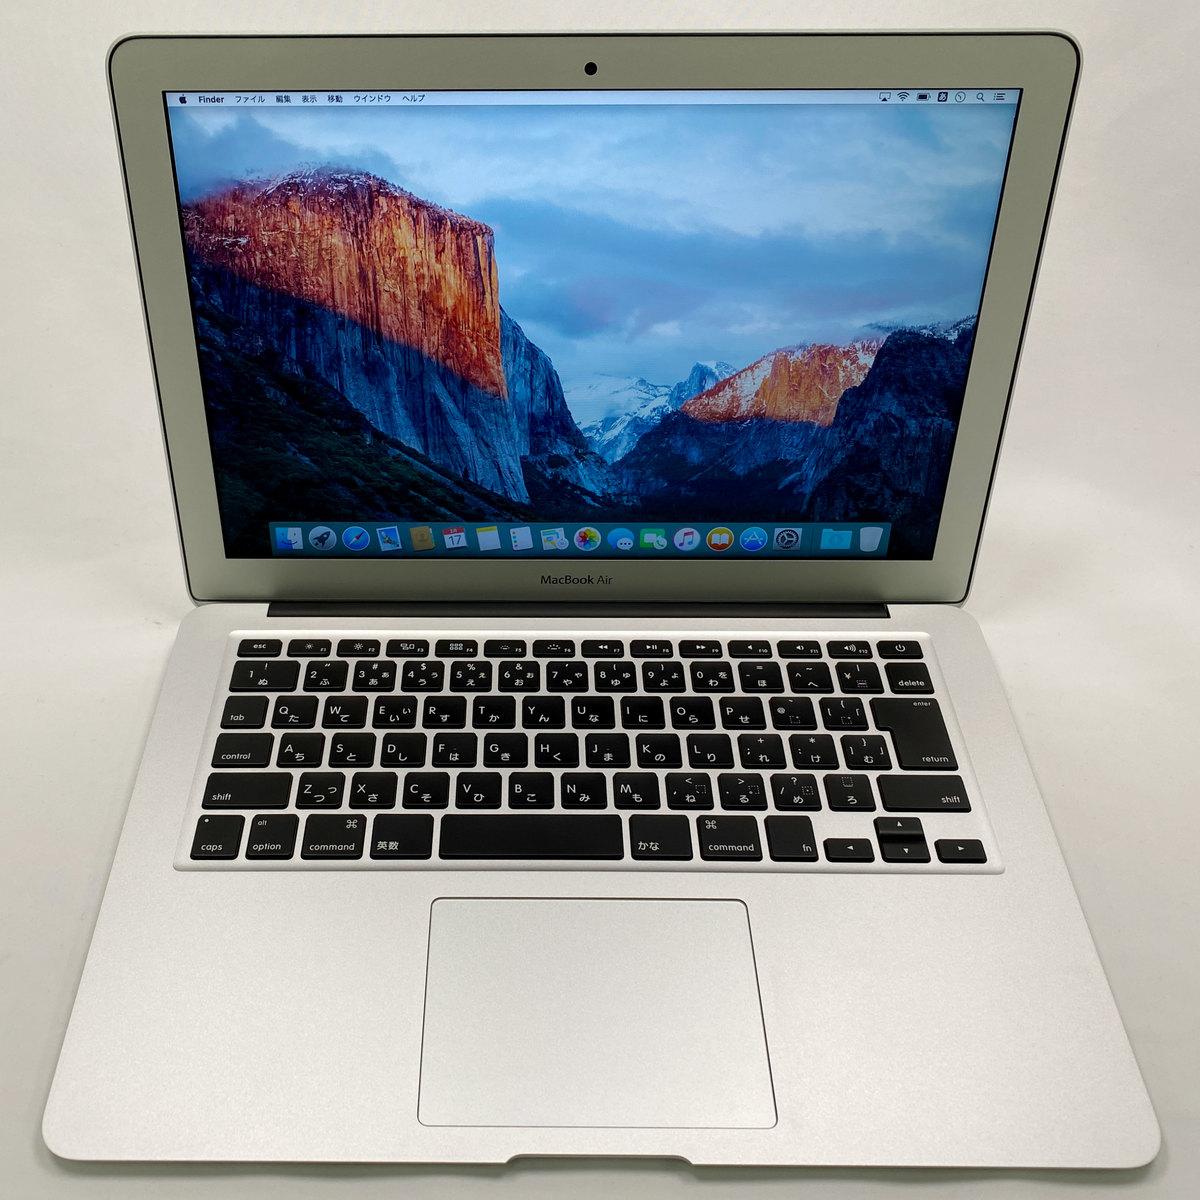 OS 公式通販 X El Capitan<10.11>搭載カラー:シルバー 中古 Apple MacBook SSD128GB ※本体のみ 割り引き 13インチ Air 2017年モデル メモリ8GB